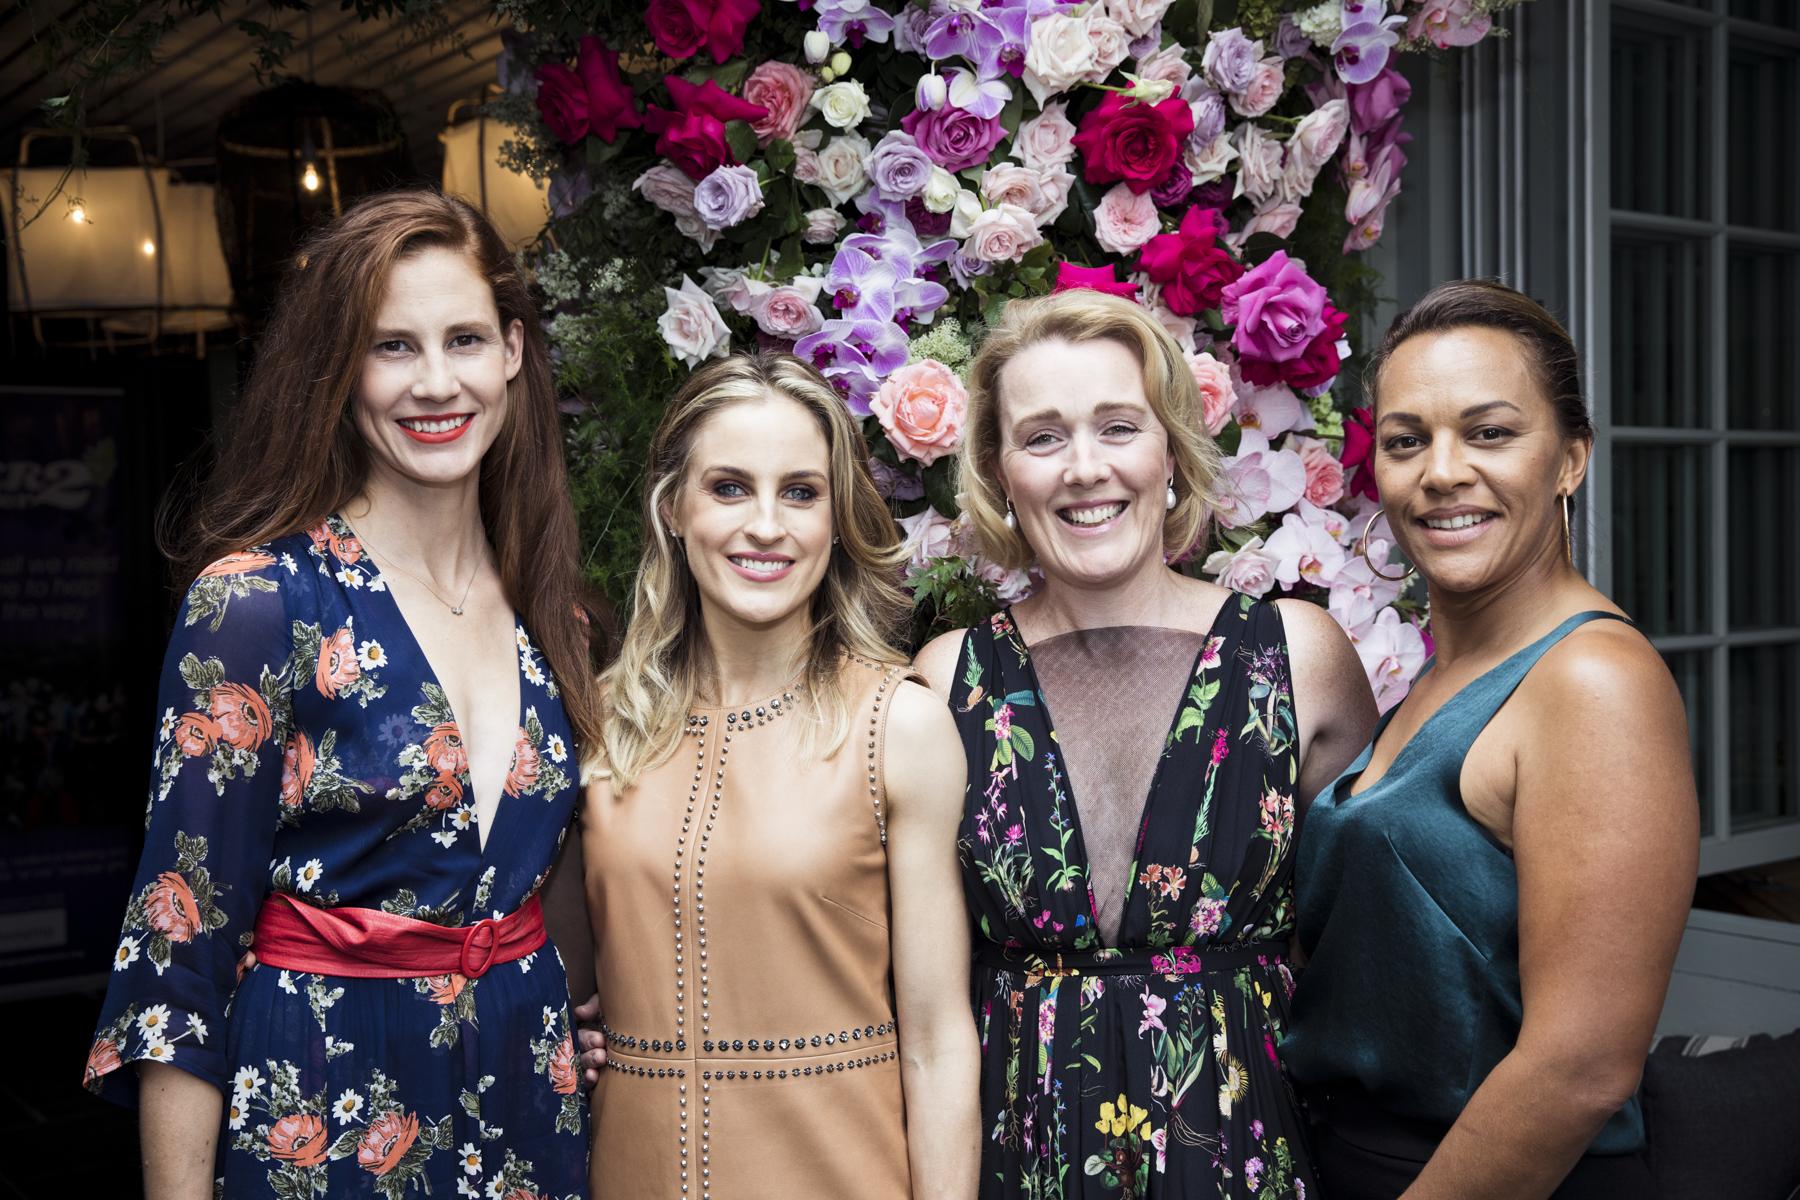 Charity Queens: Tessa Regan, Harriet Waugh, Sheryl Maynard-Fallon and Tamara Martin, who organised Friday's luncheon at Bistro Moncur.